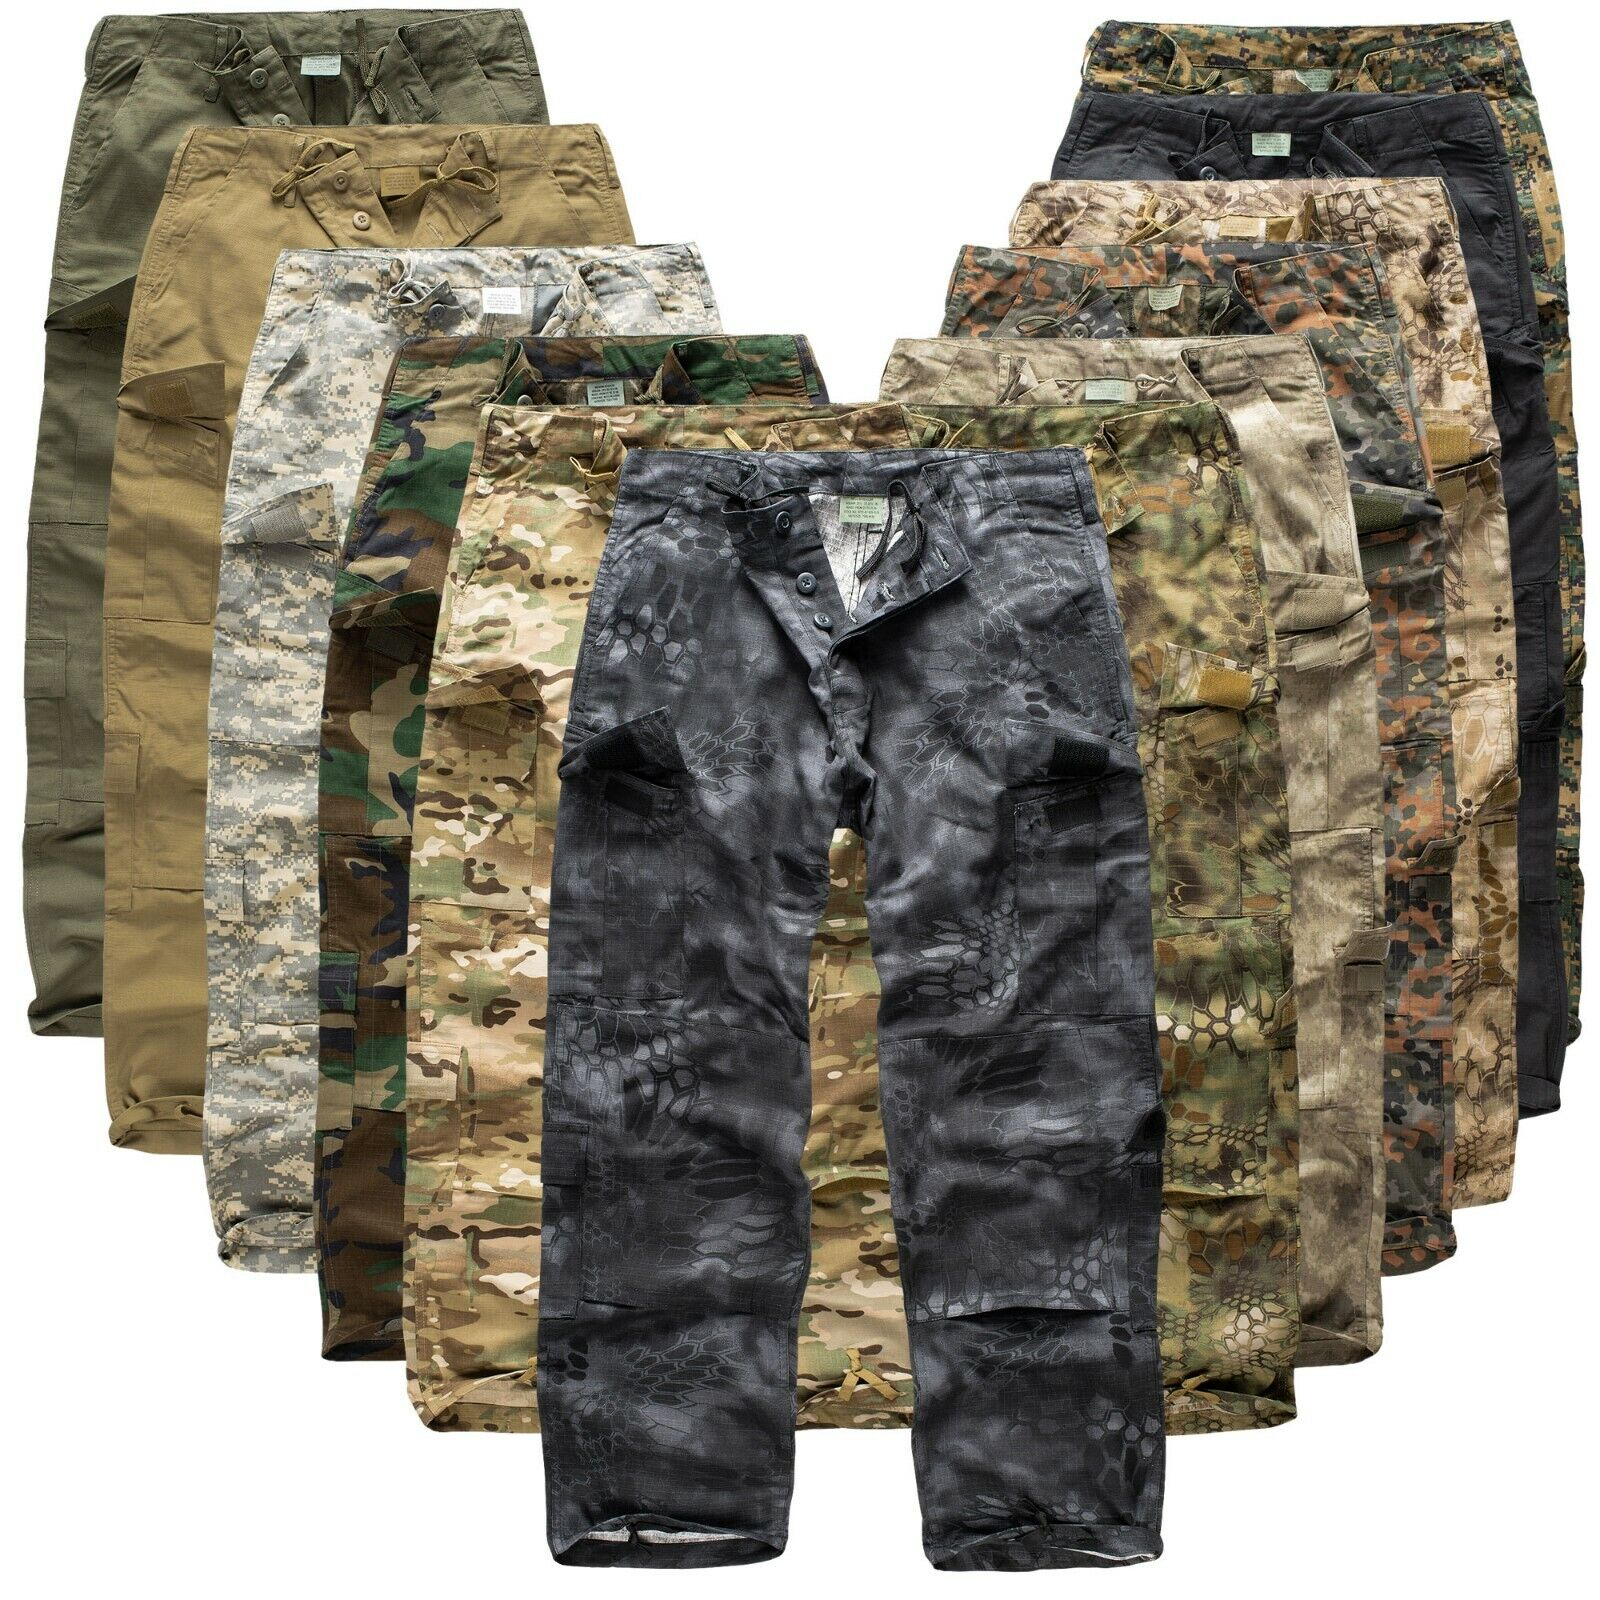 Urbandreamz US ACU Rangerhose Ripstop Freizeithose Tarnhose BDU Camouflage Hose